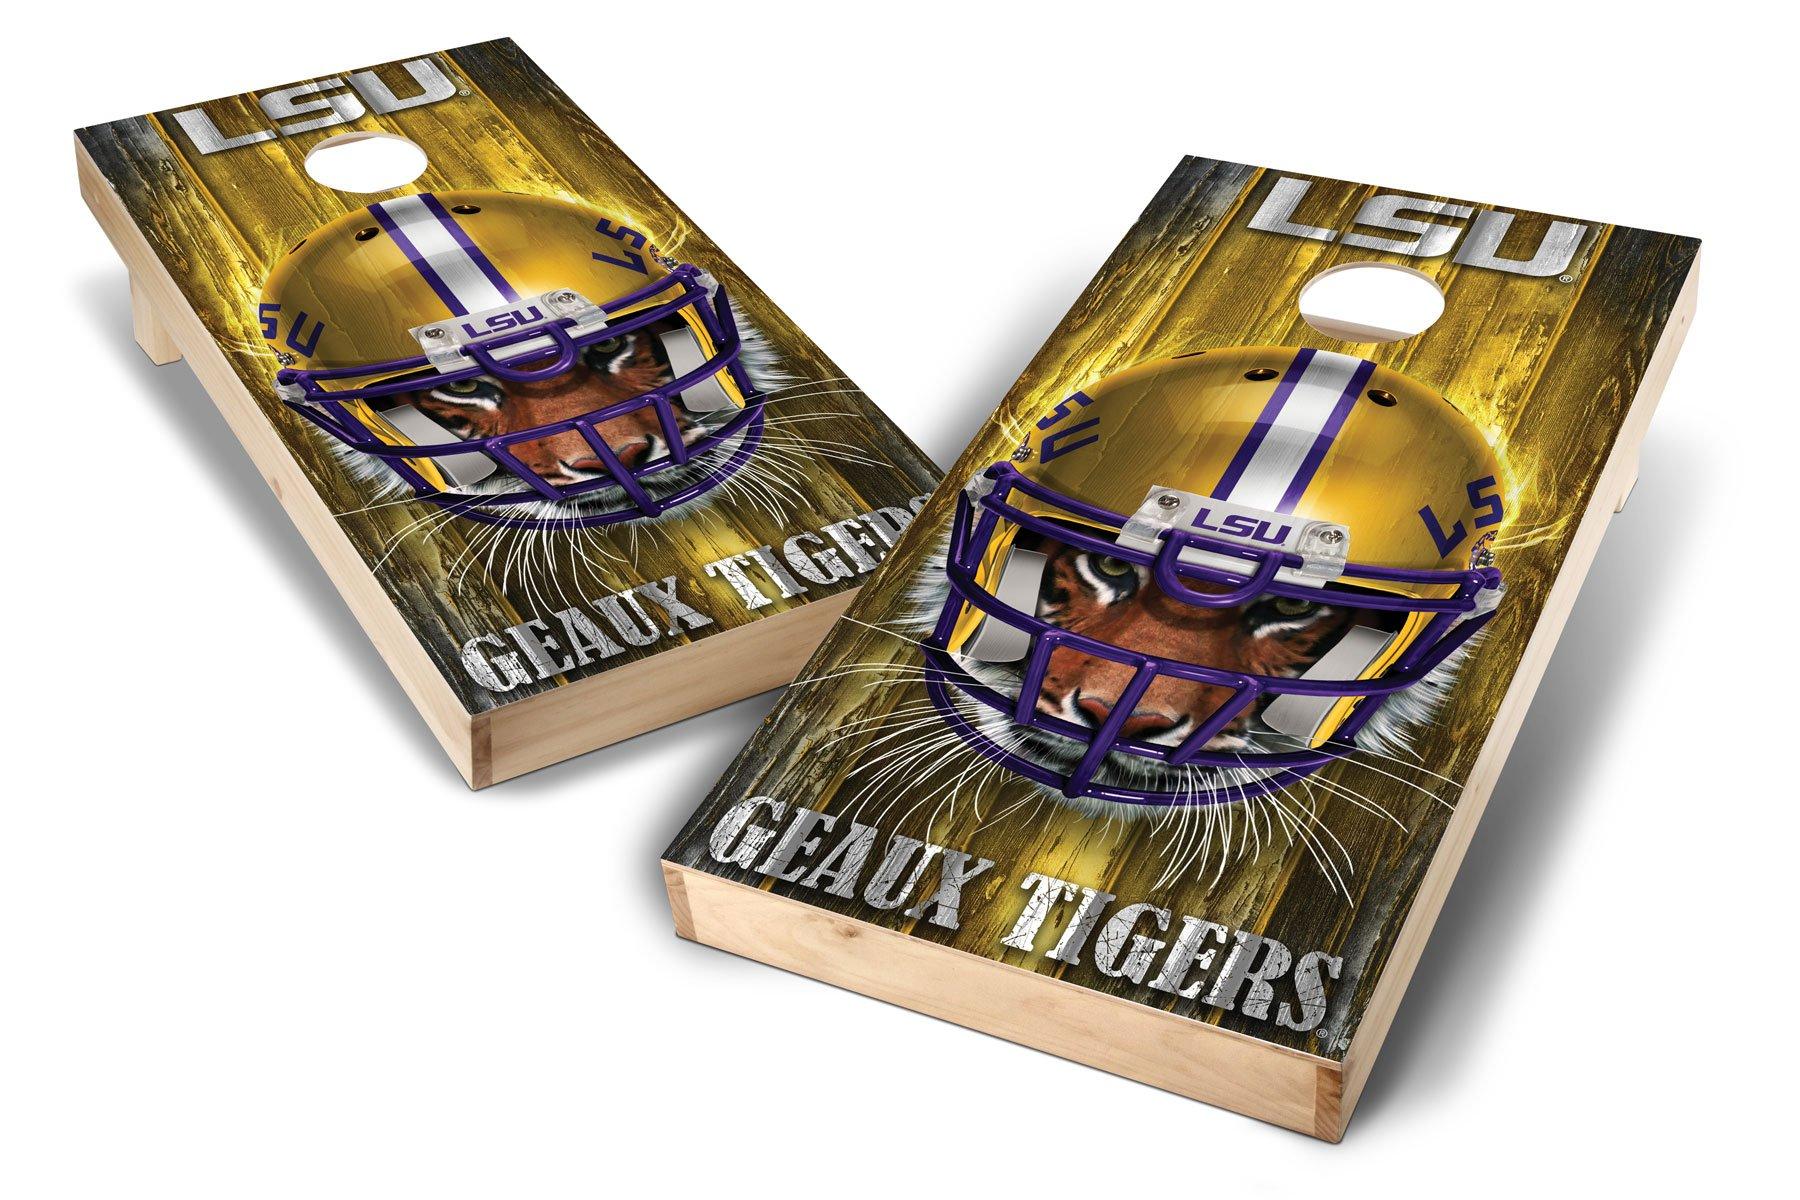 PROLINE NCAA College LSU Tigers 2'x4' Cornhole Board Set - Mascot Design, Natural Wood